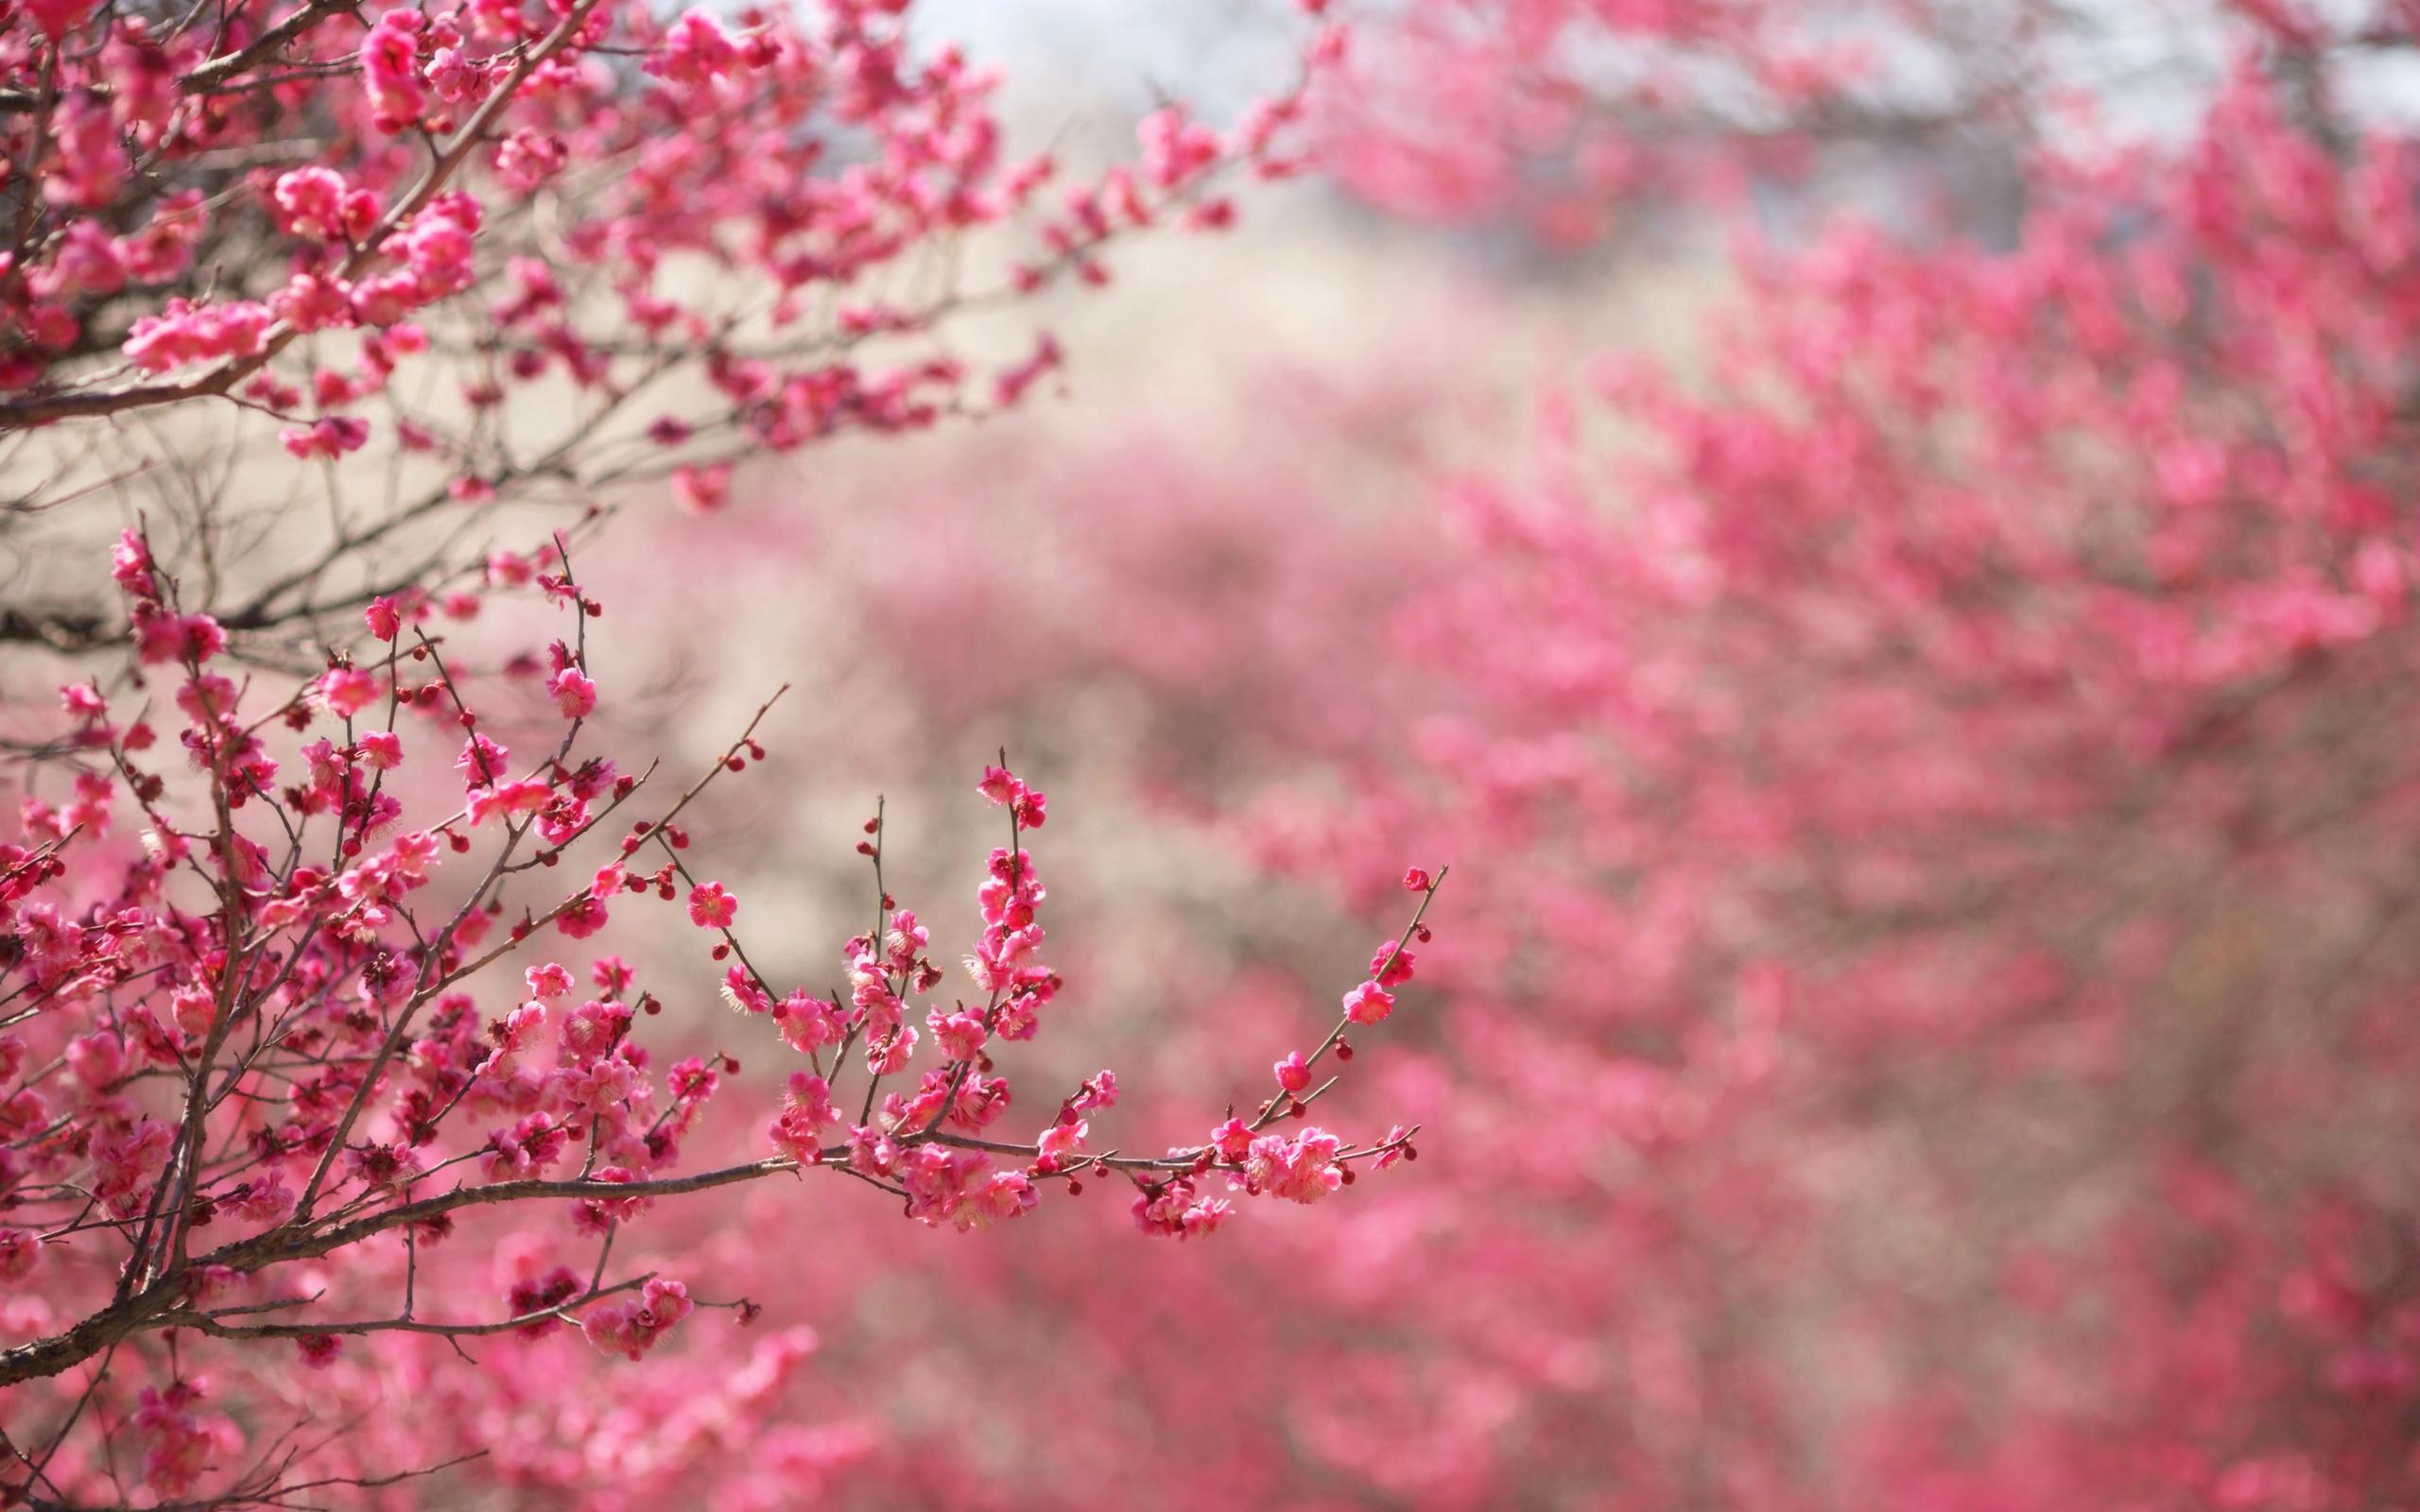 весна, цветы, красота, цвета радуги, картинки, обои